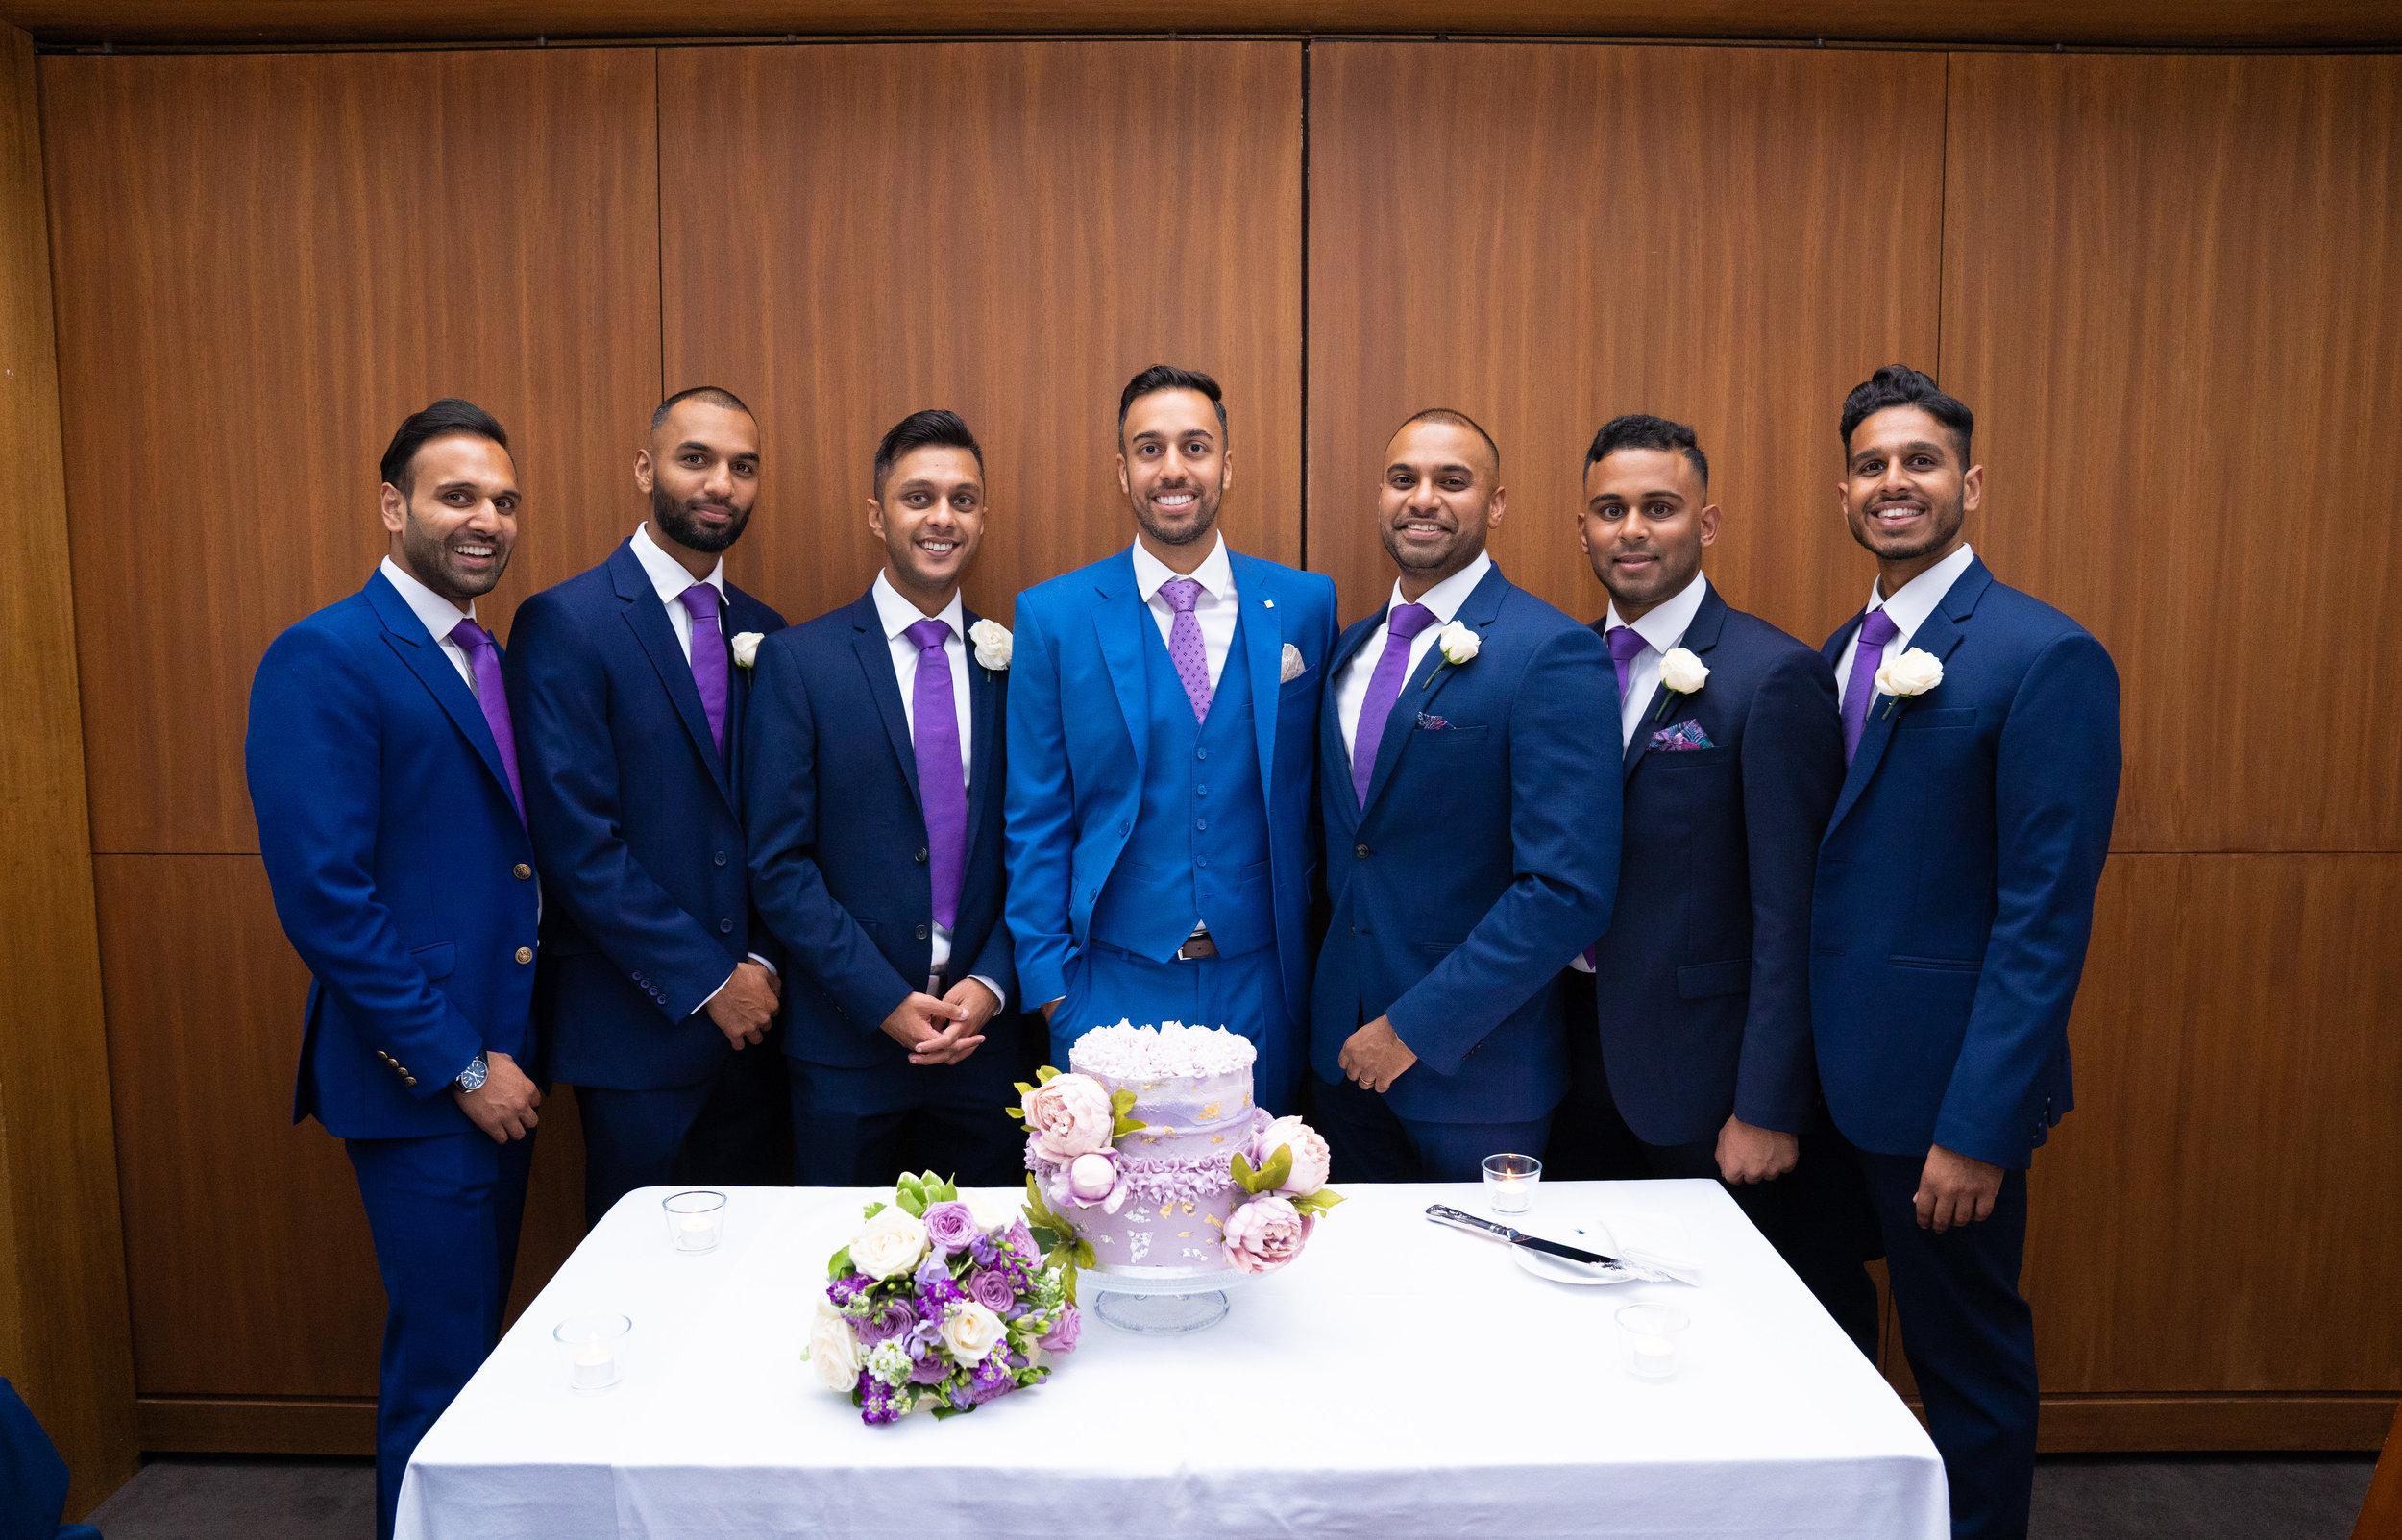 anglo-asian-hindu-civil-wedding-photography-videography-london-portrait-bluebird-restaurant-chelsea-85